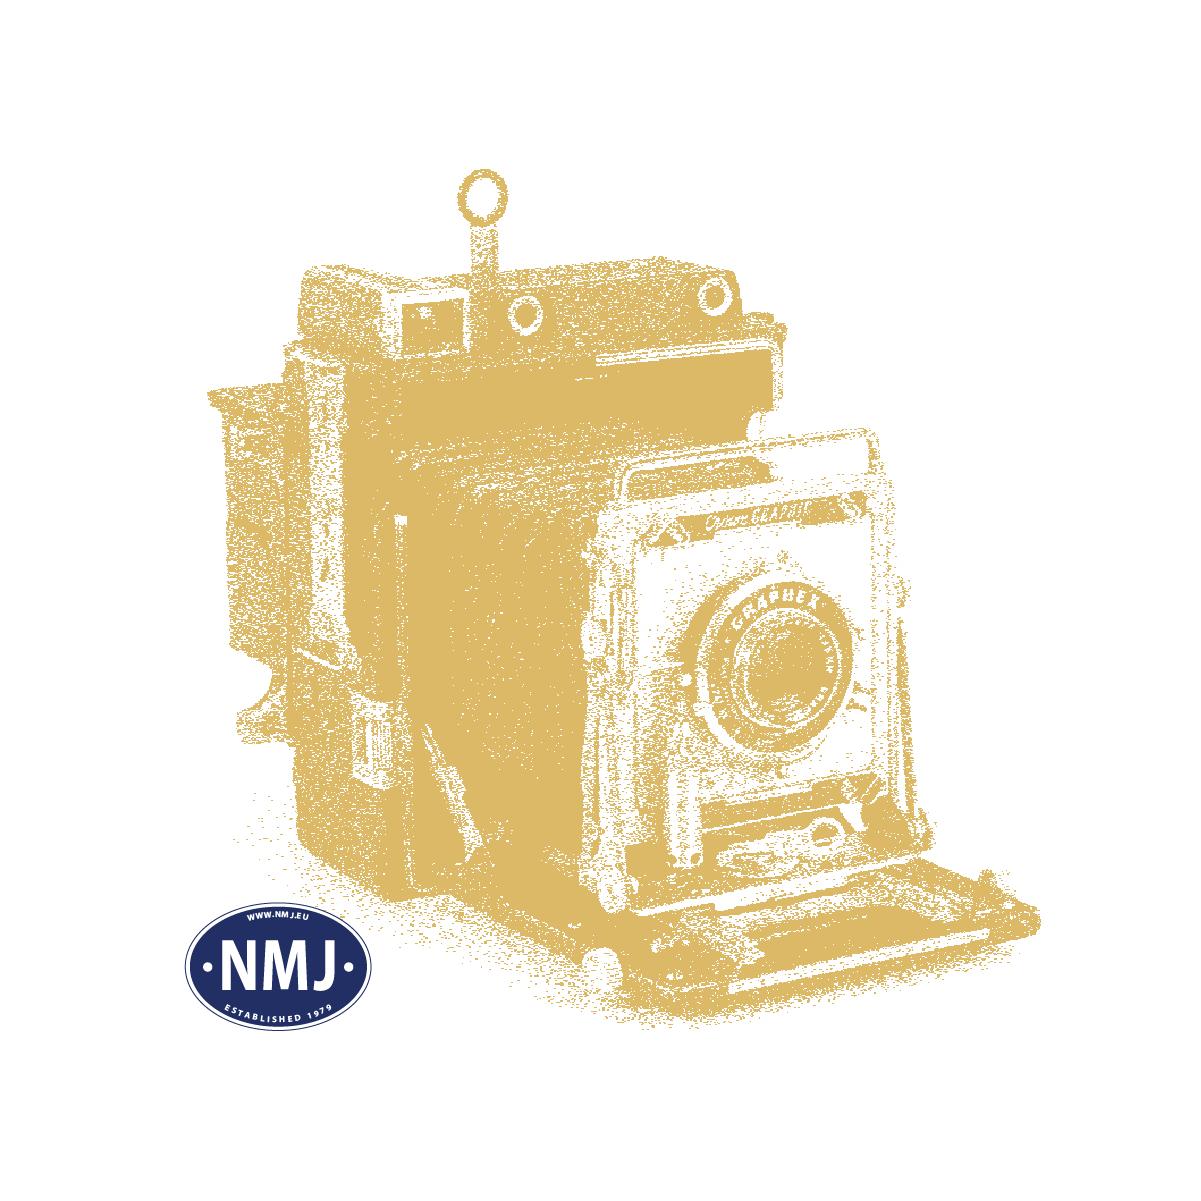 WODFS627 - Lysegrønt Statisk Gress, 12mm, 28g